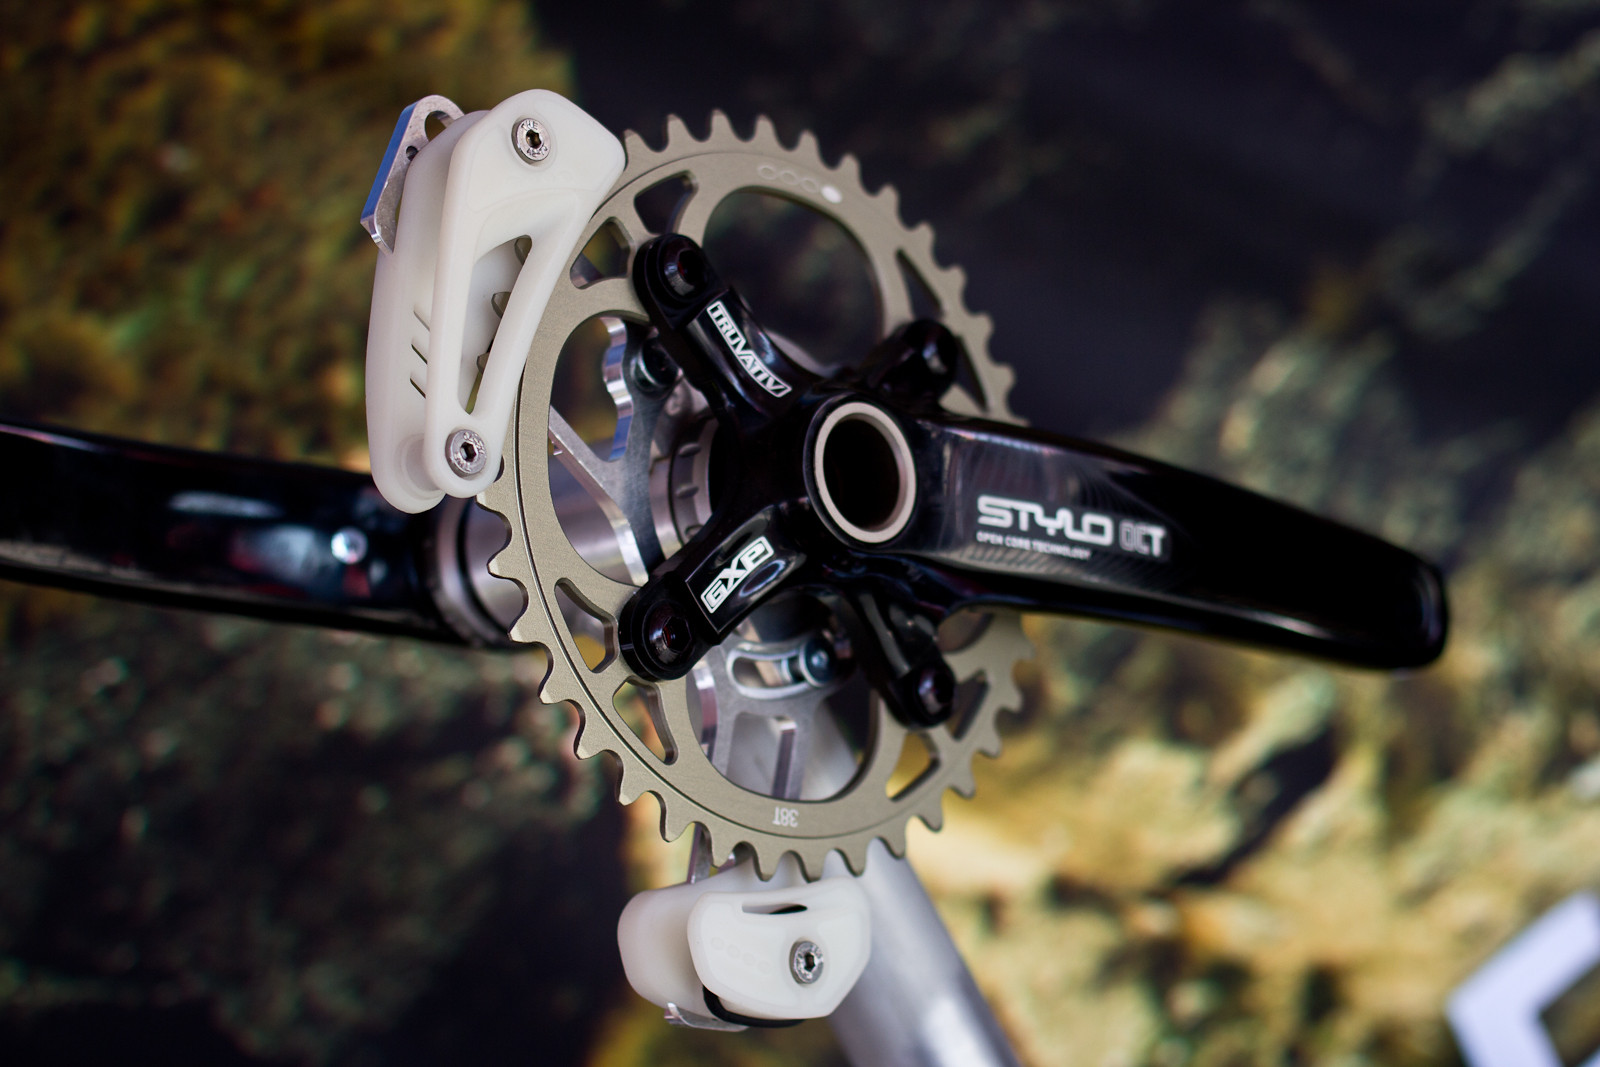 Prototype Gamut TRAILs Chainguide - Sea Otter Classic - 2013 Sea Otter Classic Pit Bits - 1st Edition - Mountain Biking Pictures - Vital MTB